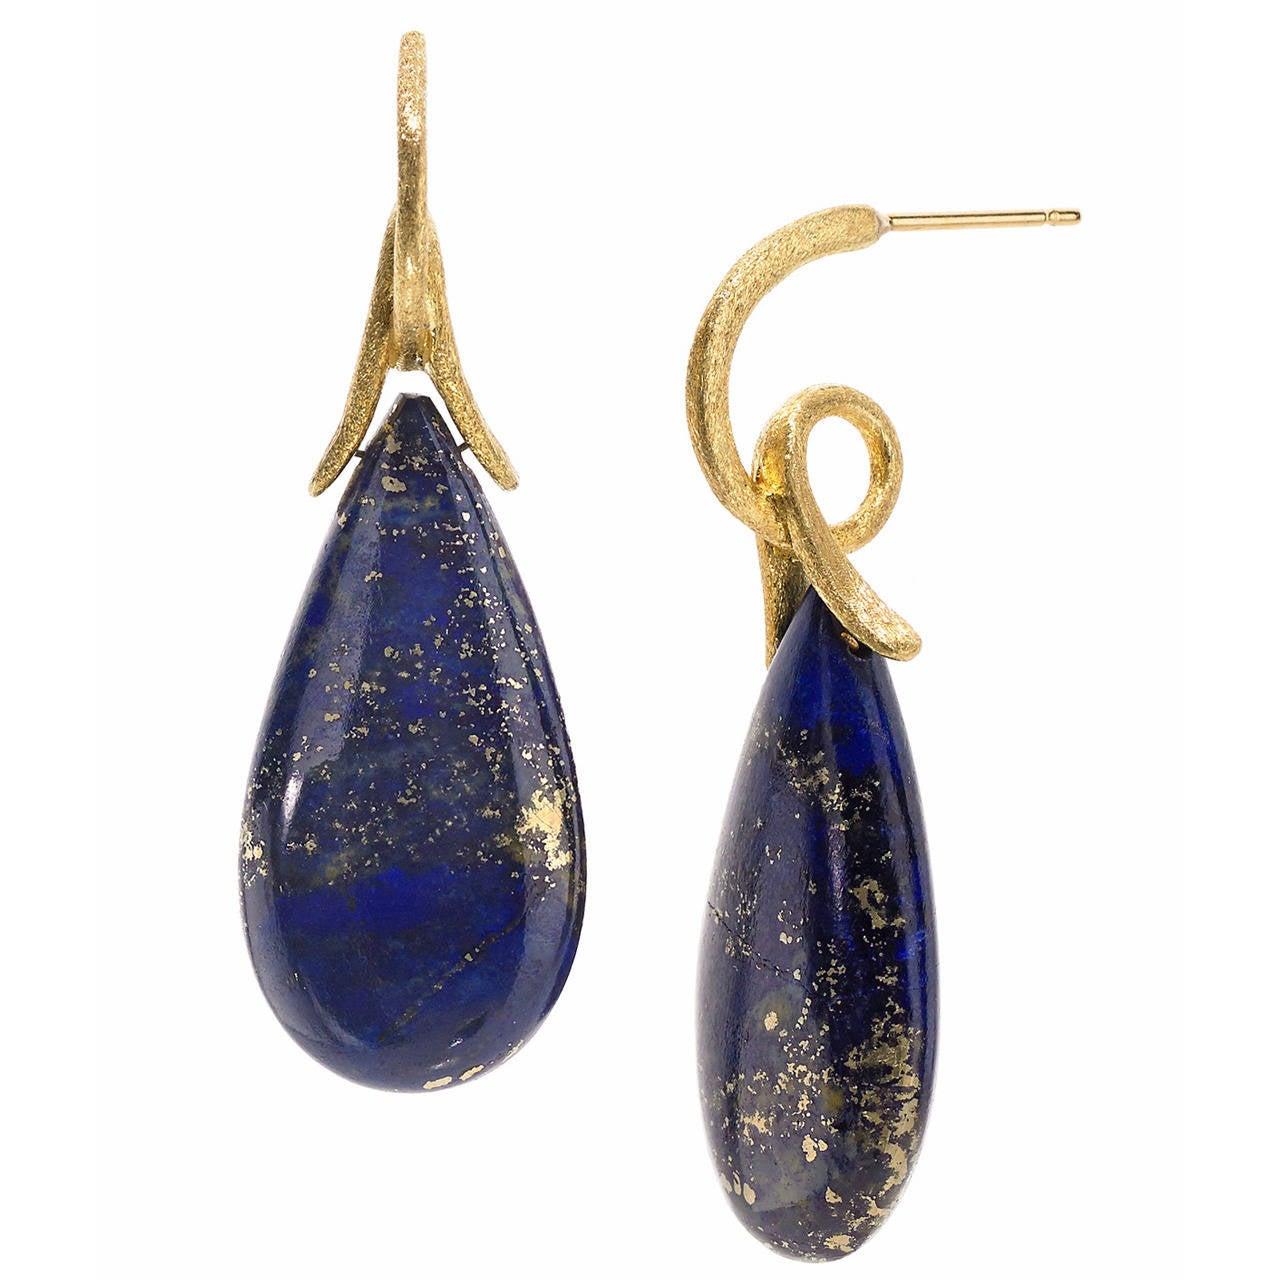 Joseph Murray Lapis Lazuli Satin Gold Loop Earrings At 1stdibs